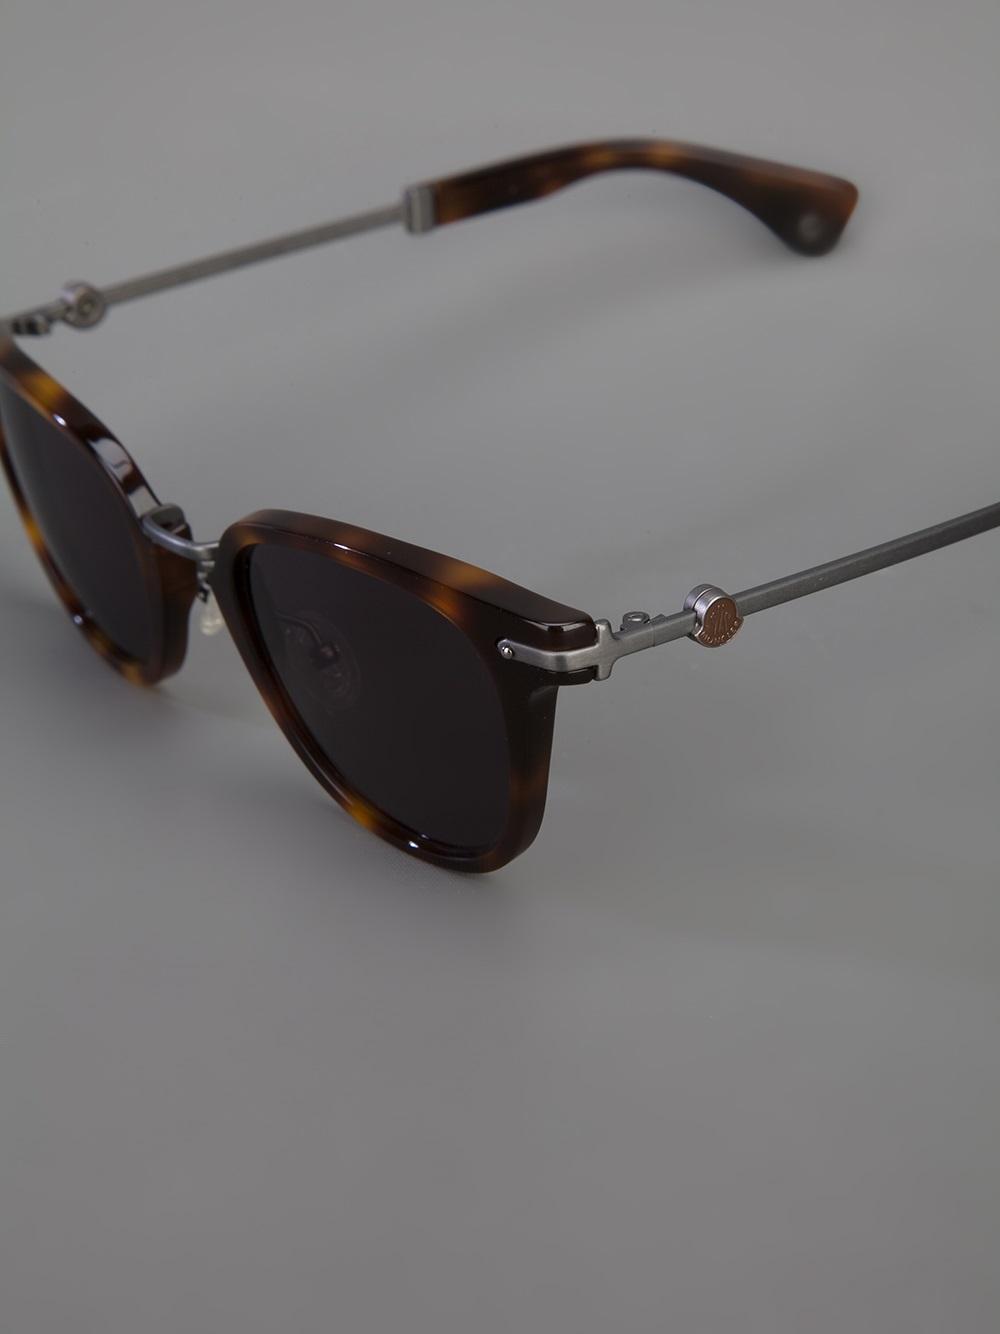 Moncler Mc502 Sunglasses in Brown (Grey)